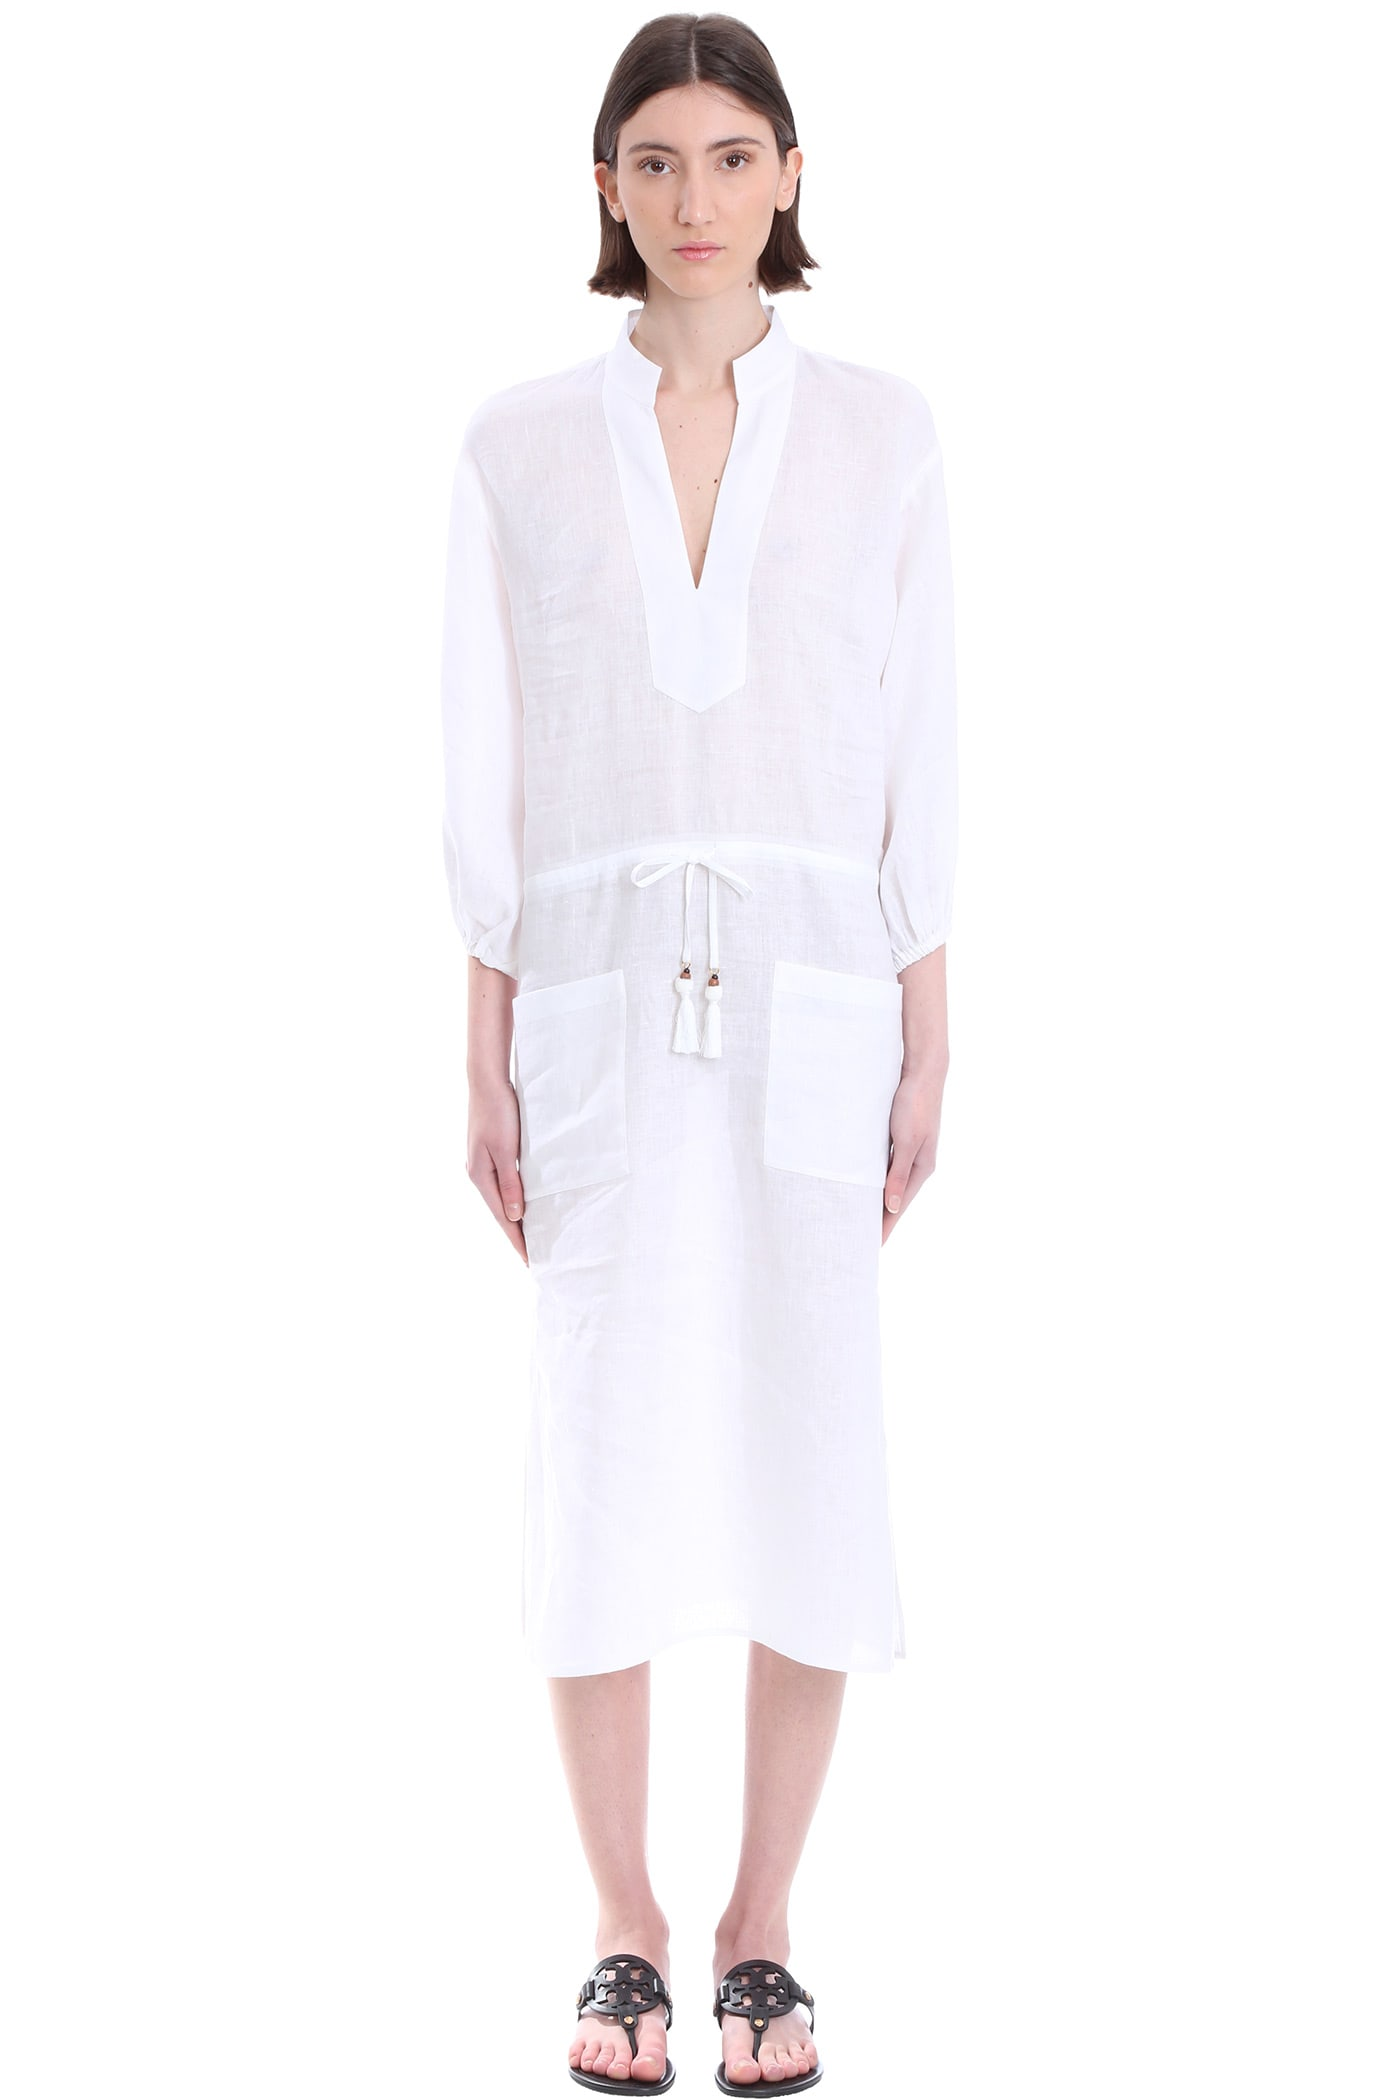 Tory Burch Tunic Dress In White Linen